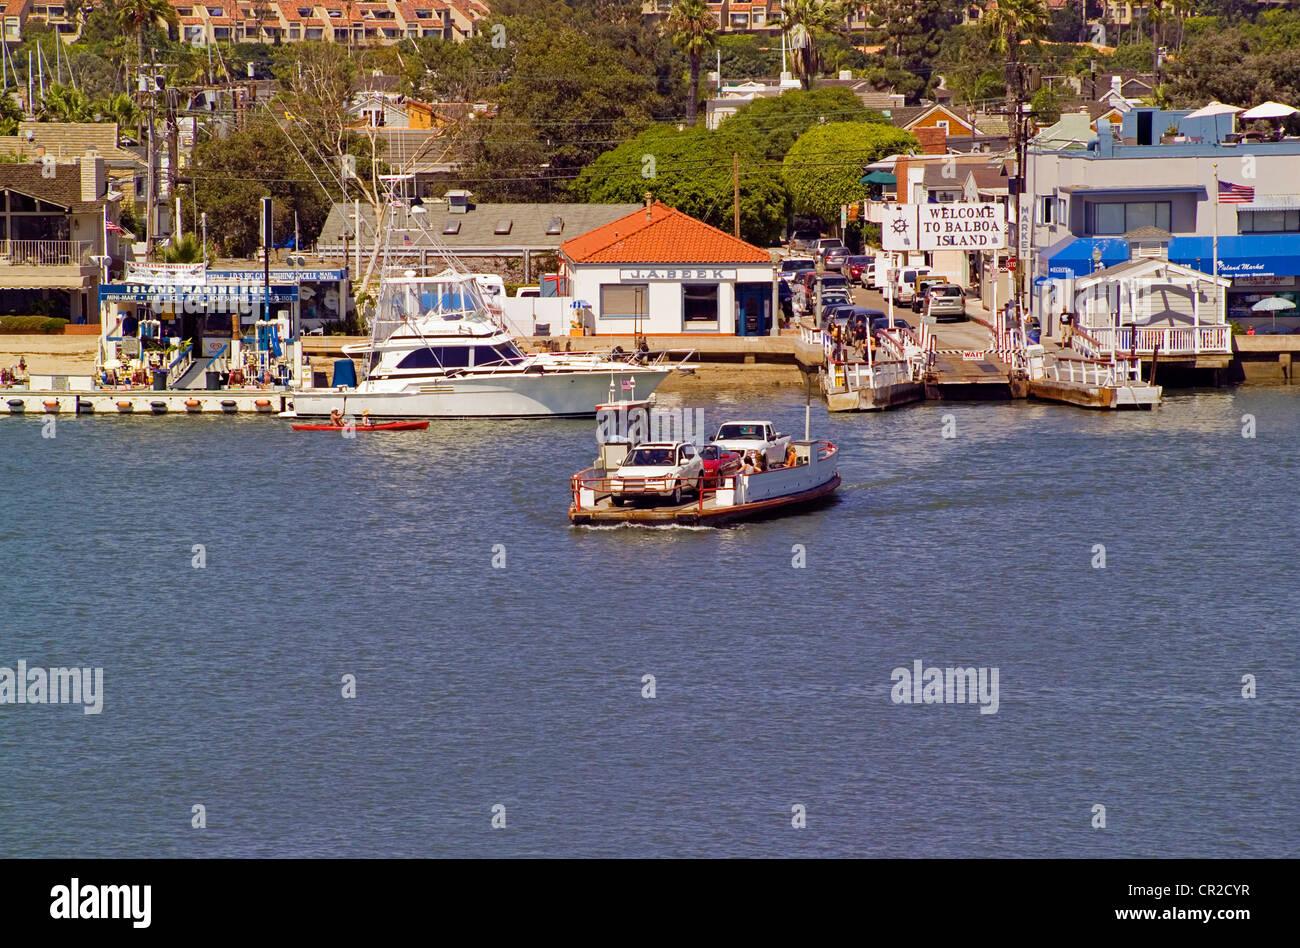 Historic three-car ferryboats cross Newport Harbor between the Fun Zone on the Balboa Peninsula and Balboa Island - Stock Image